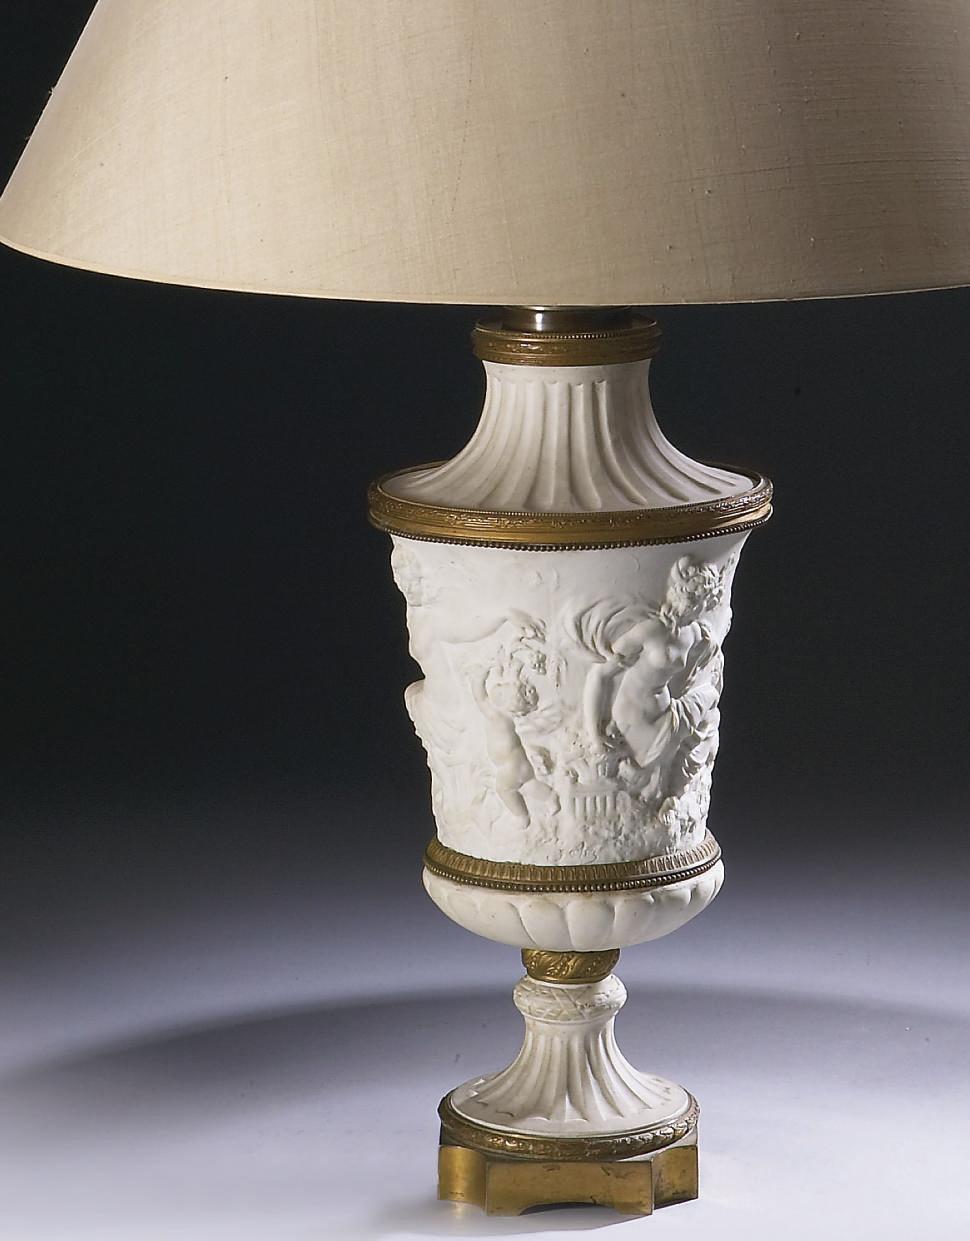 LAMPE DU XIXEME SIECLE